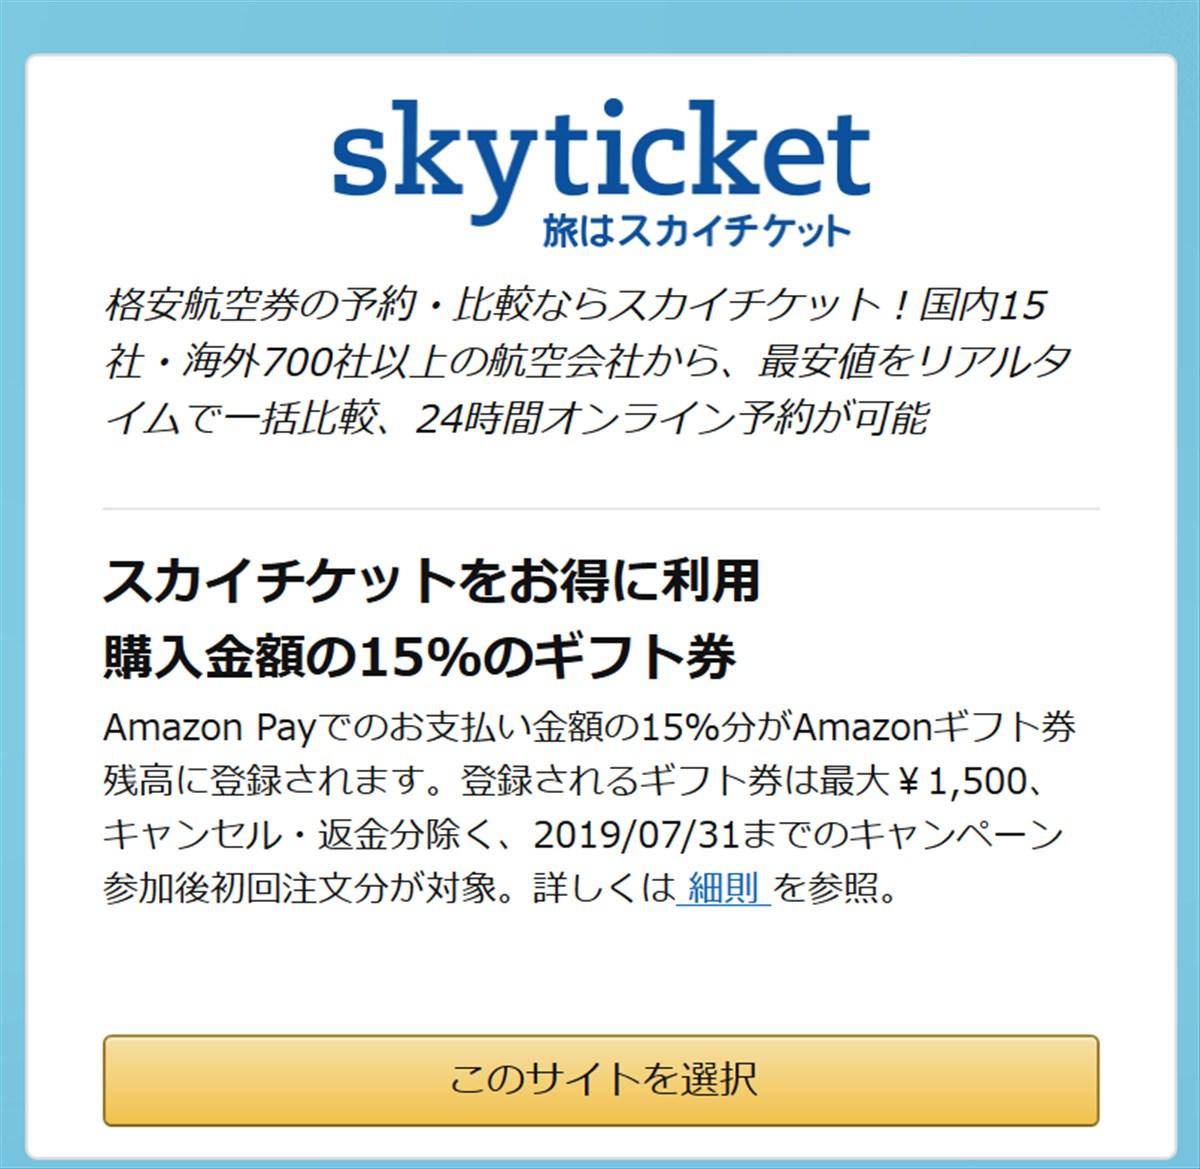 AmazonPayでスカイチケットが15%還元